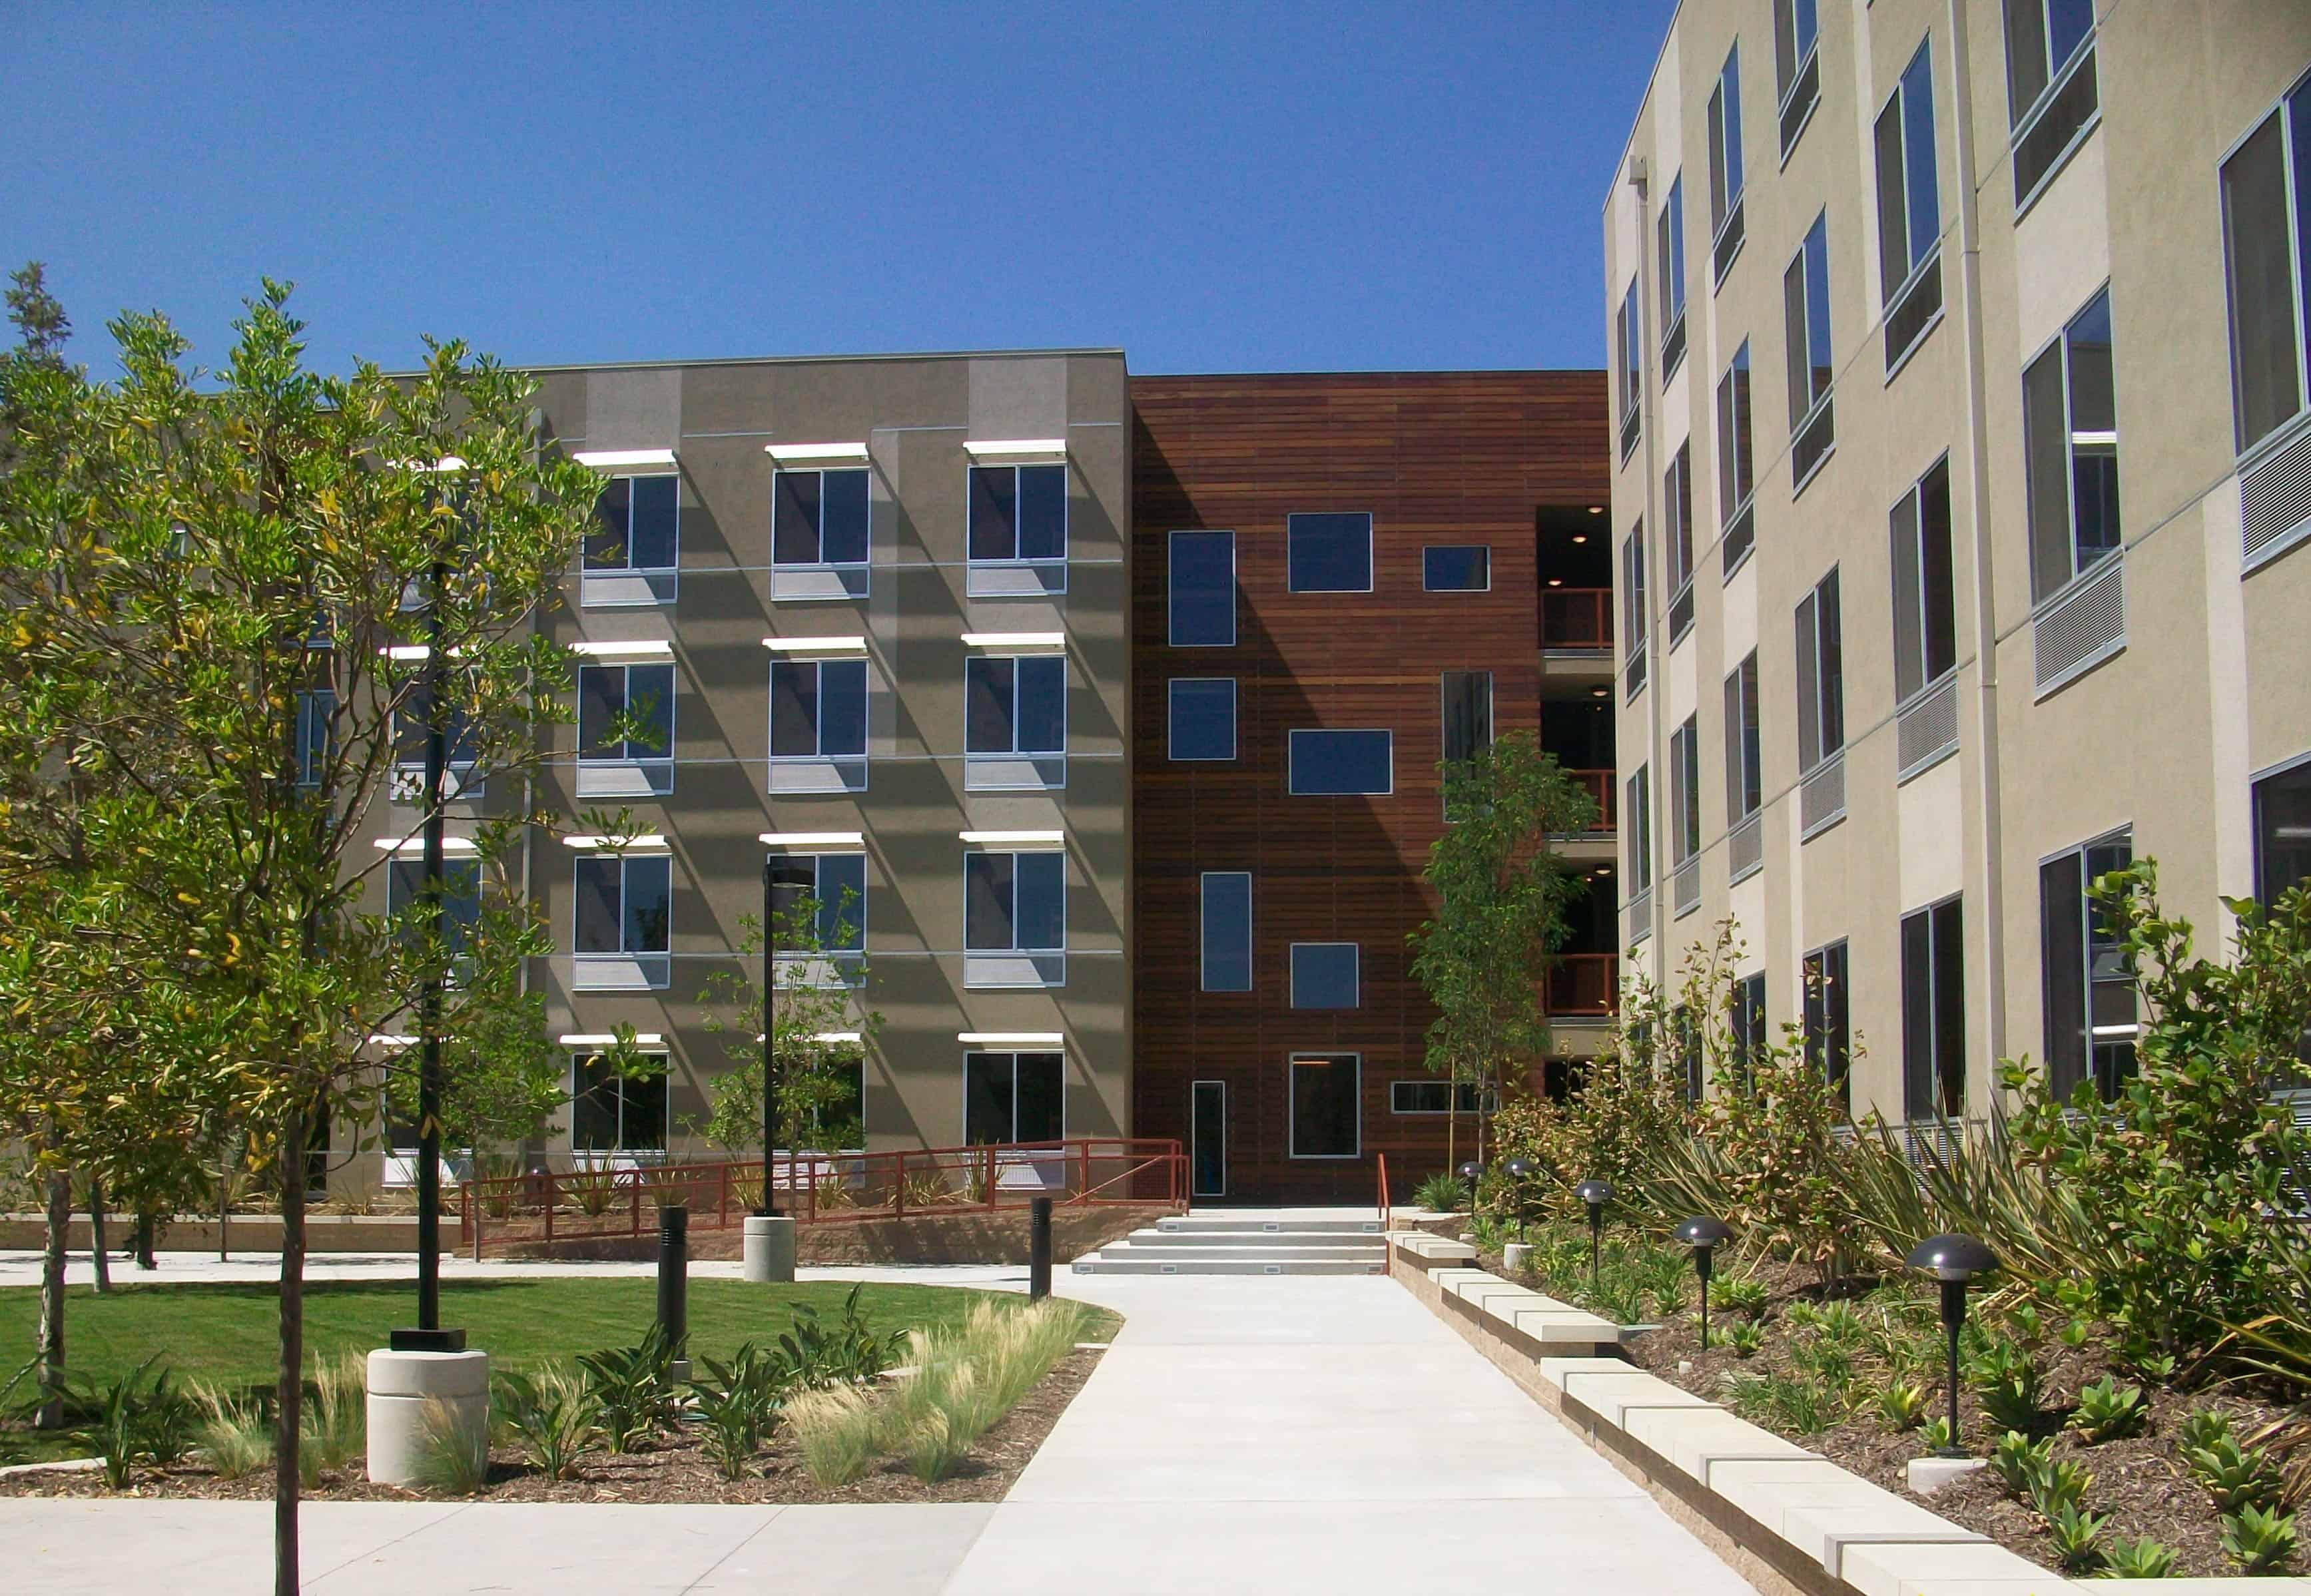 Los Angeles - California State University Northridge